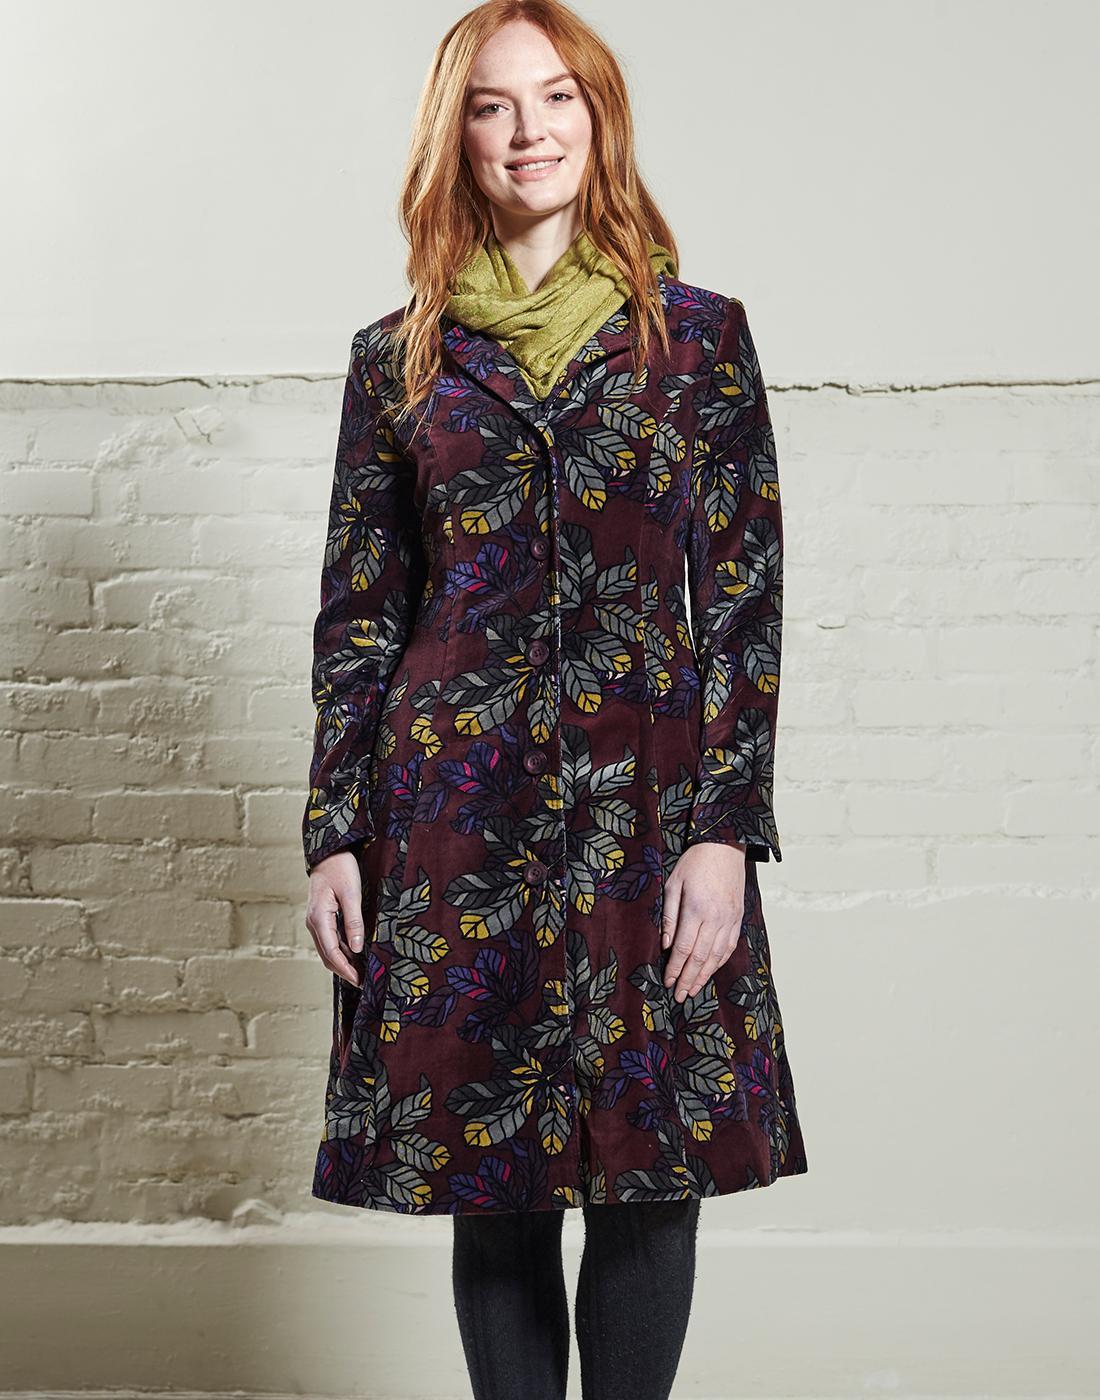 NOMADS Womens Retro Vintage Velvet Coat - Rosewood